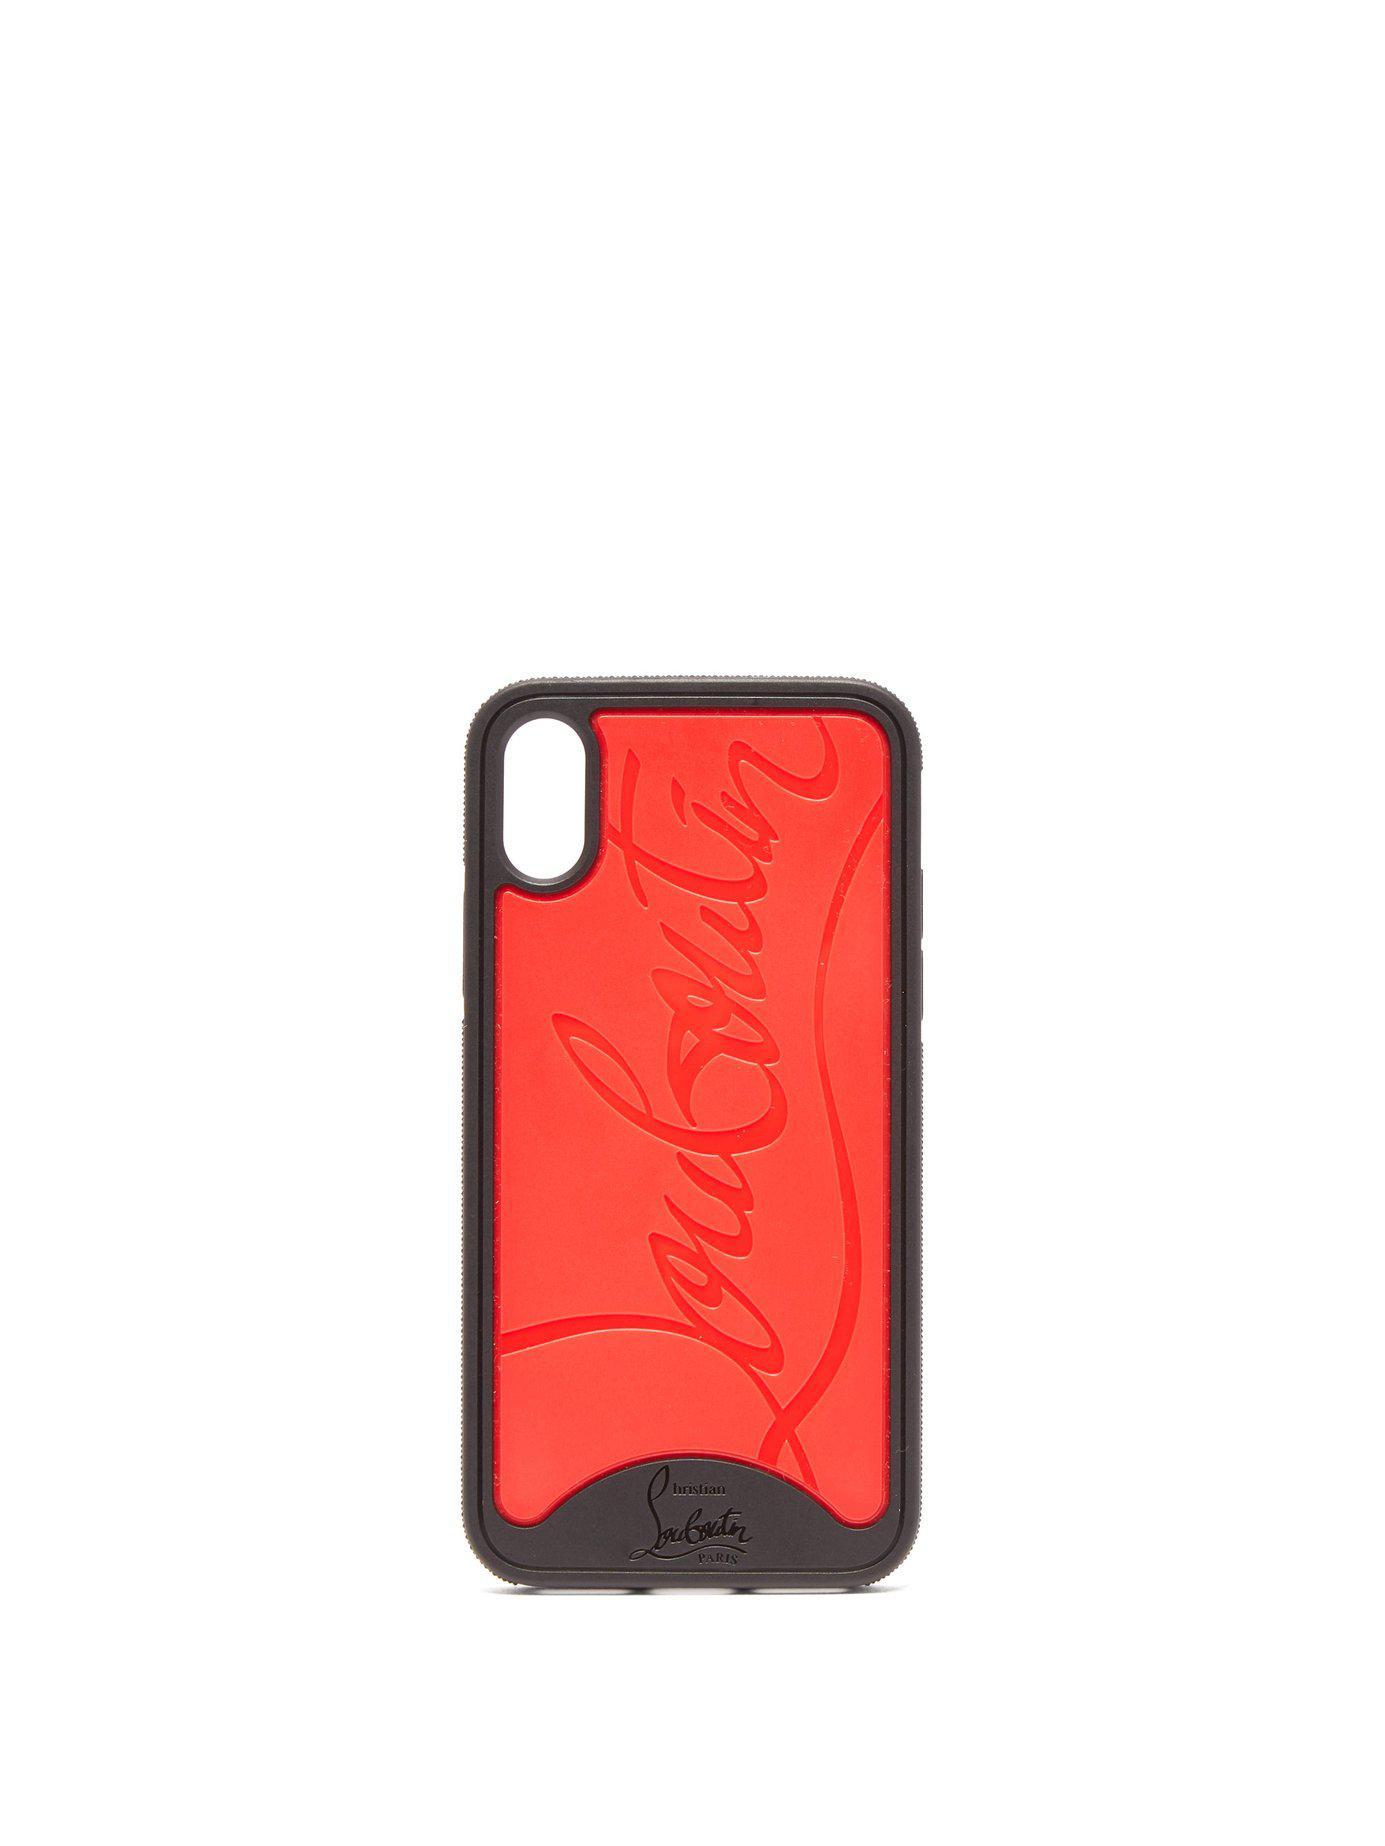 burton logo red 2 iphone case